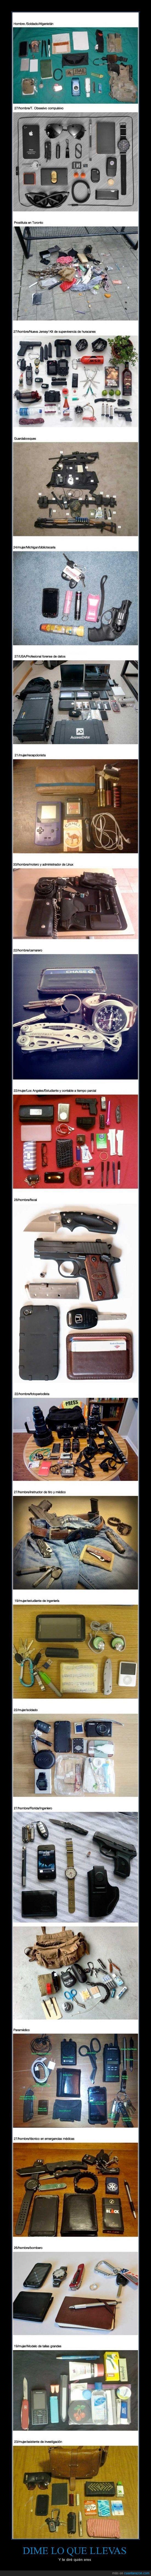 arma,bibliotecaria,bolso,bombero,encima,lleva,medico,mochila,movil,navaja